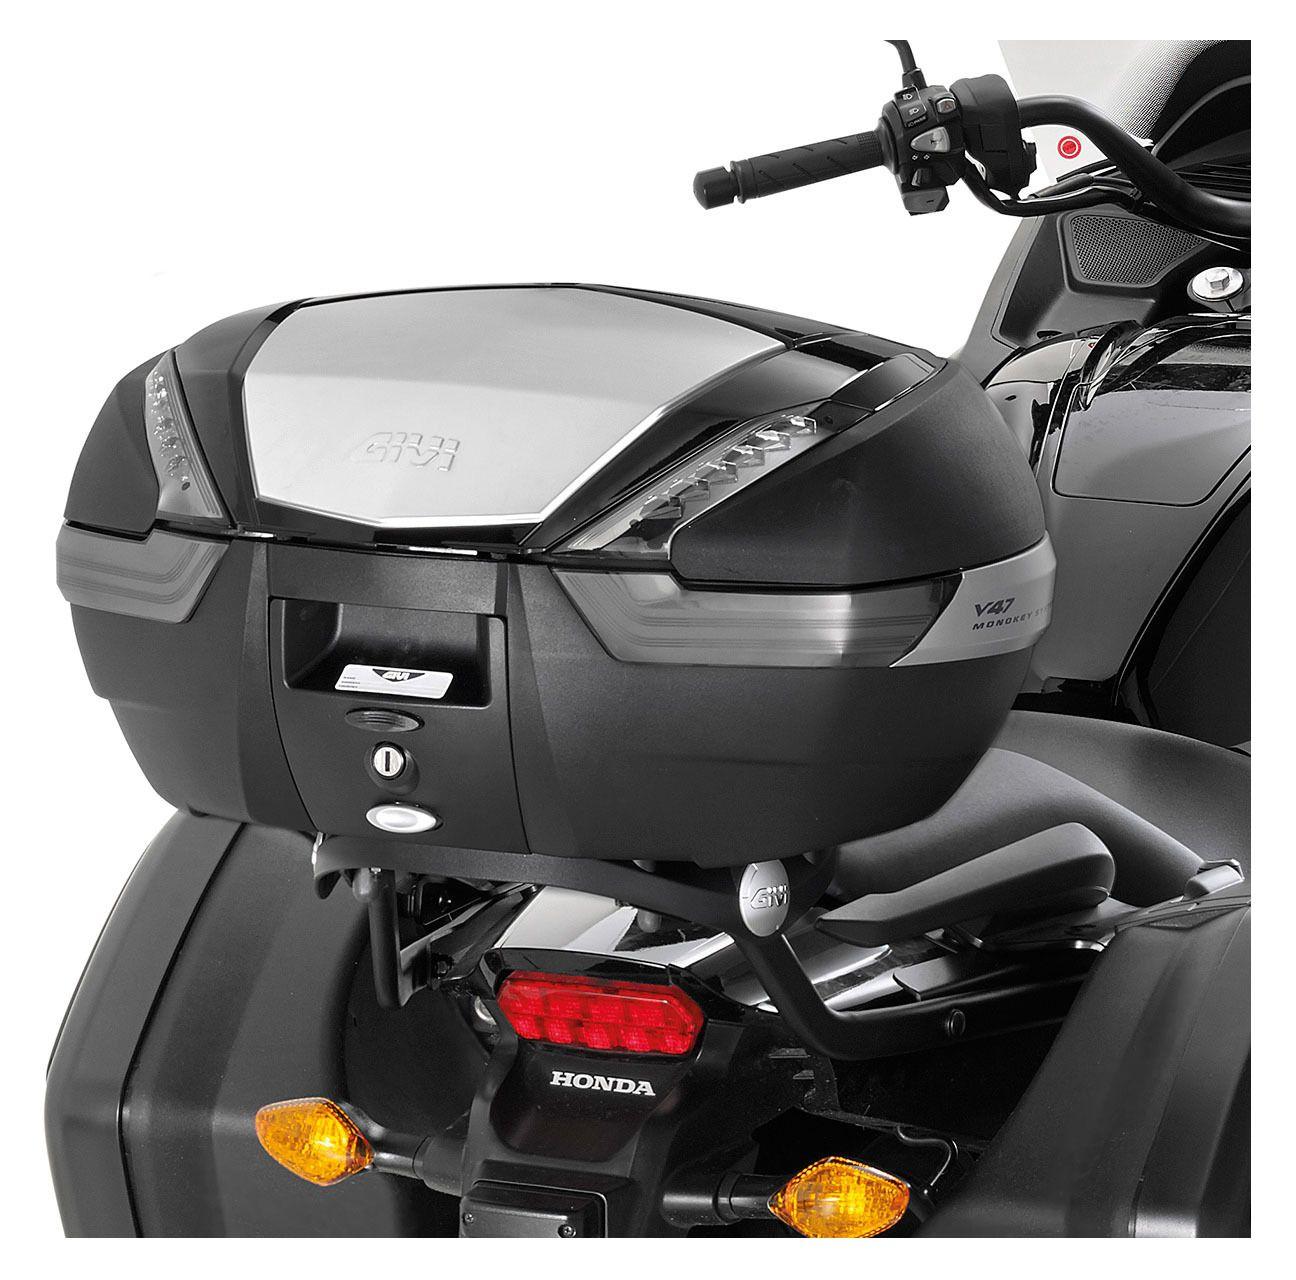 Givi 1133fz Top Case Support Brackets Honda Ctx700 2014